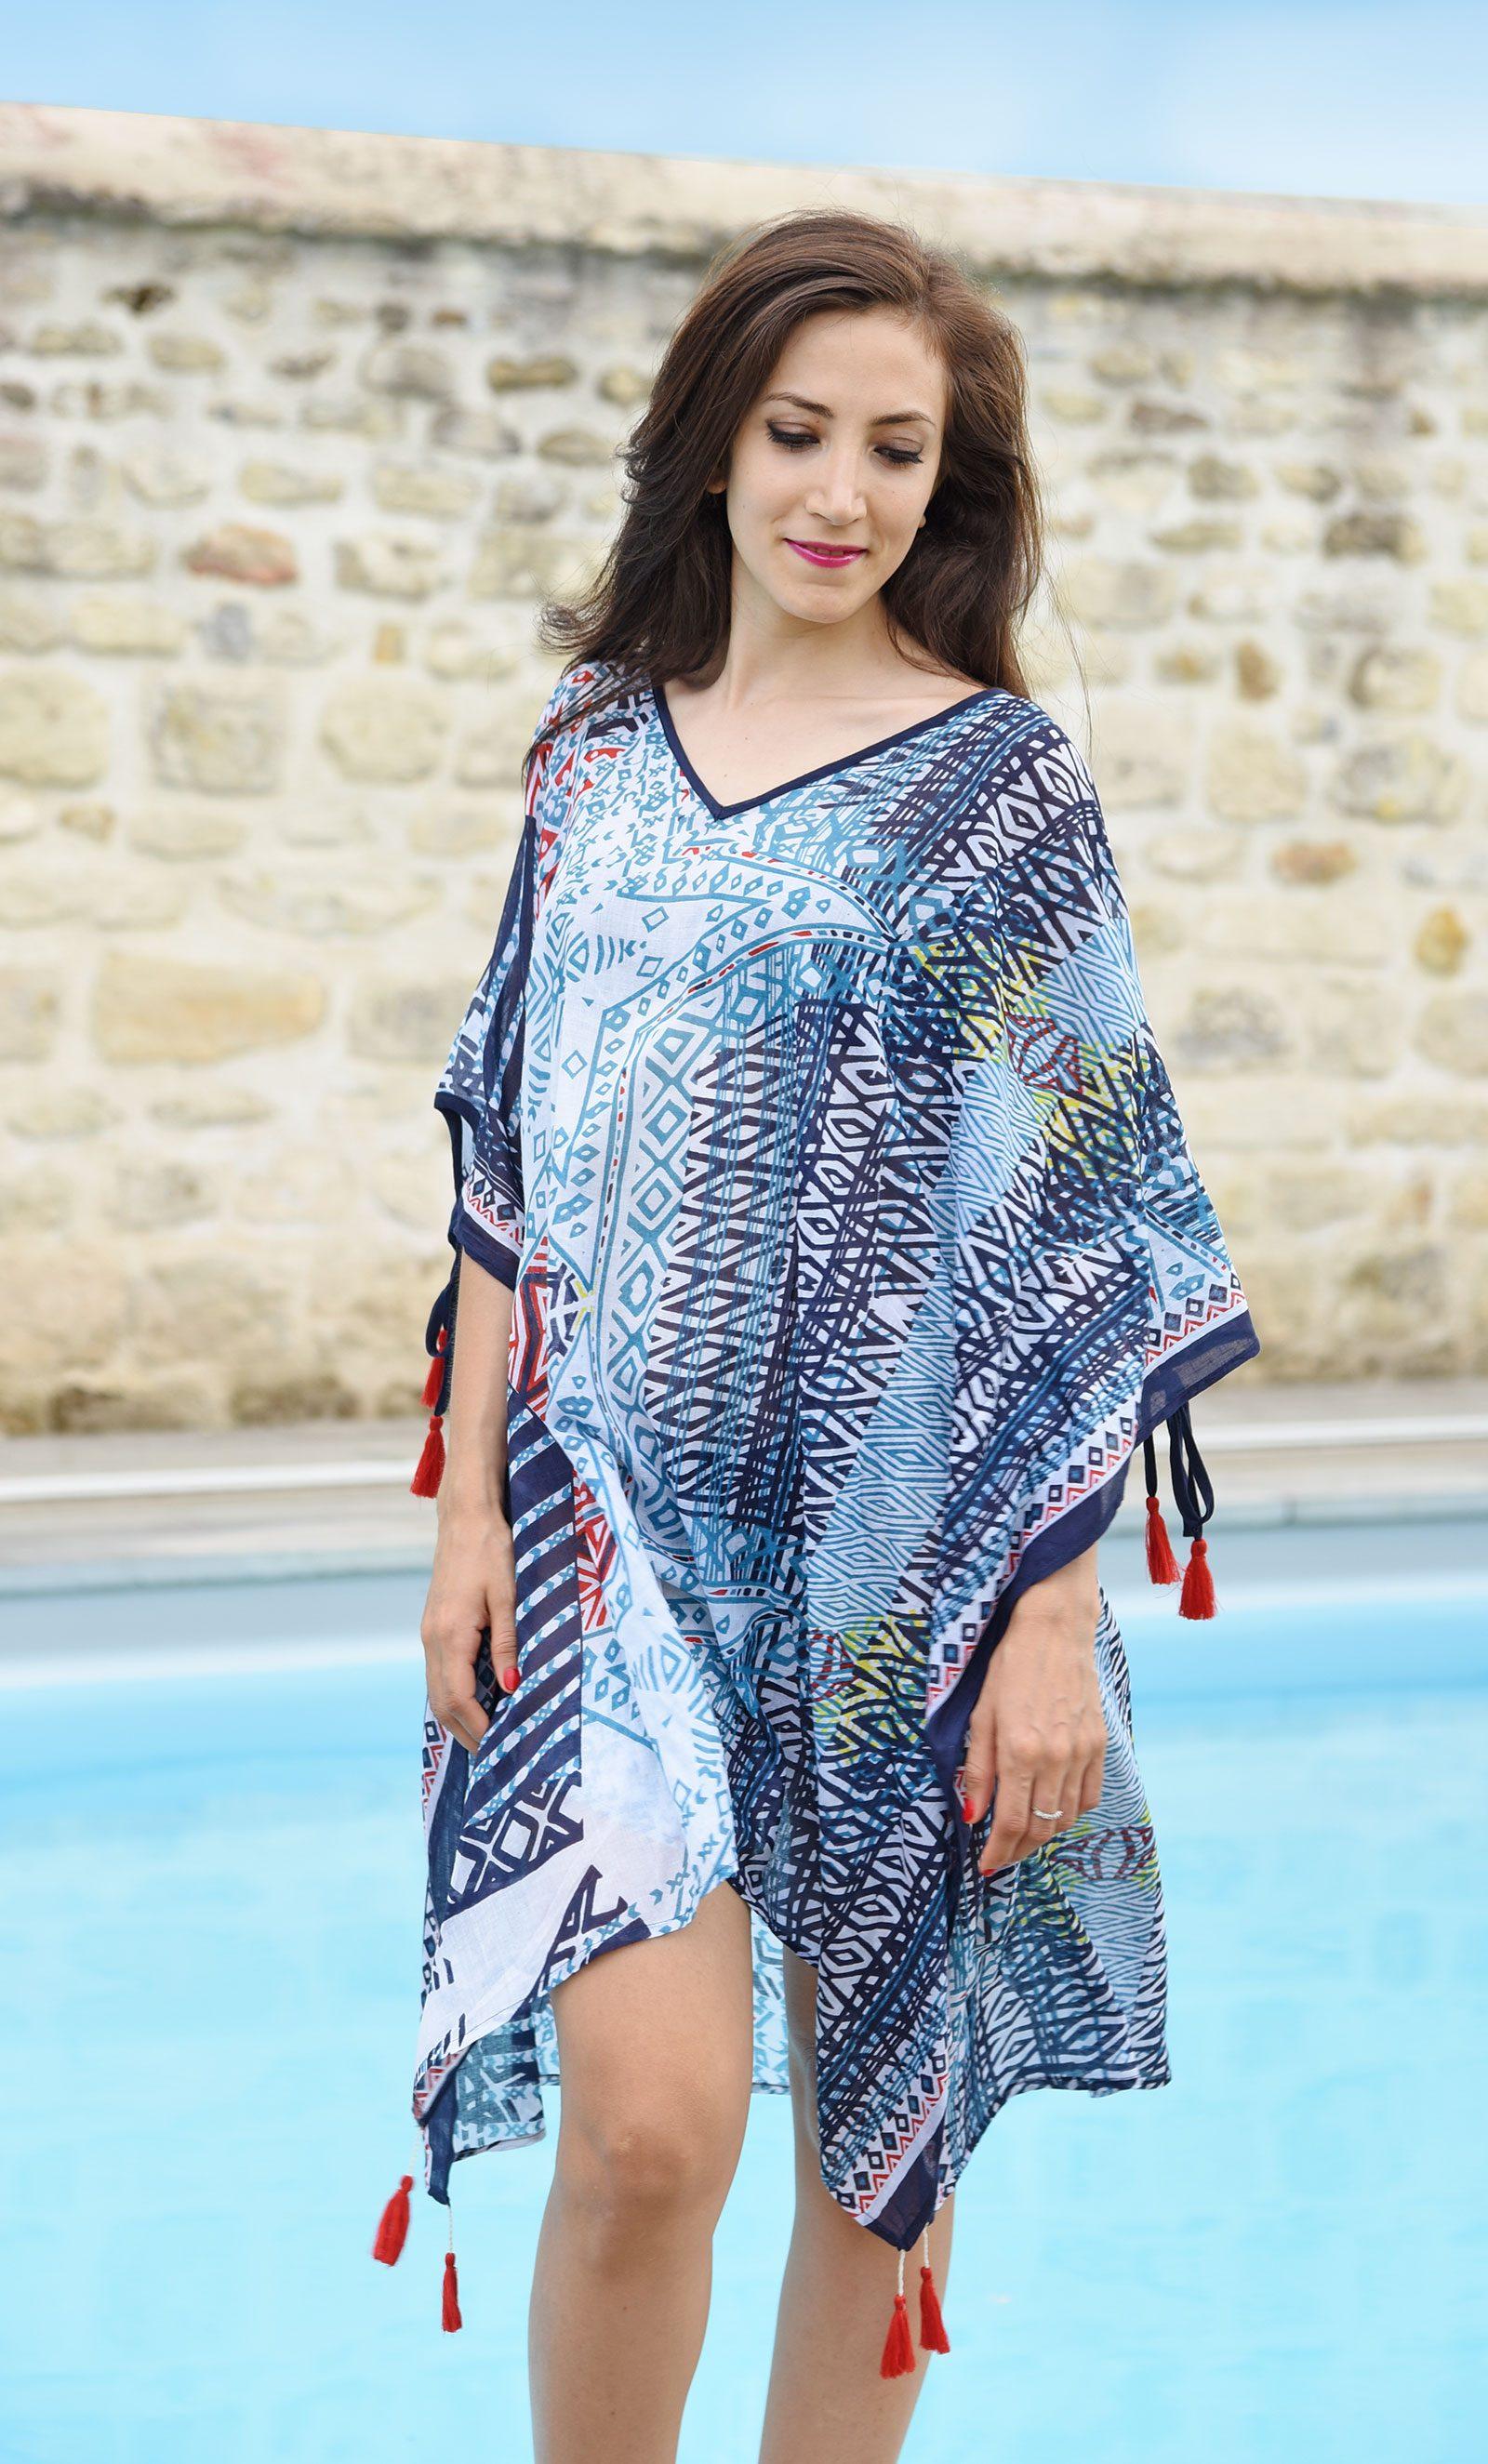 http://lookbook.allee-du-foulard.fr/wp-content/uploads/2018/06/0674-ADF-Accessoires-de-mode-LB-Estival-tunique-3-1600x2650.jpg